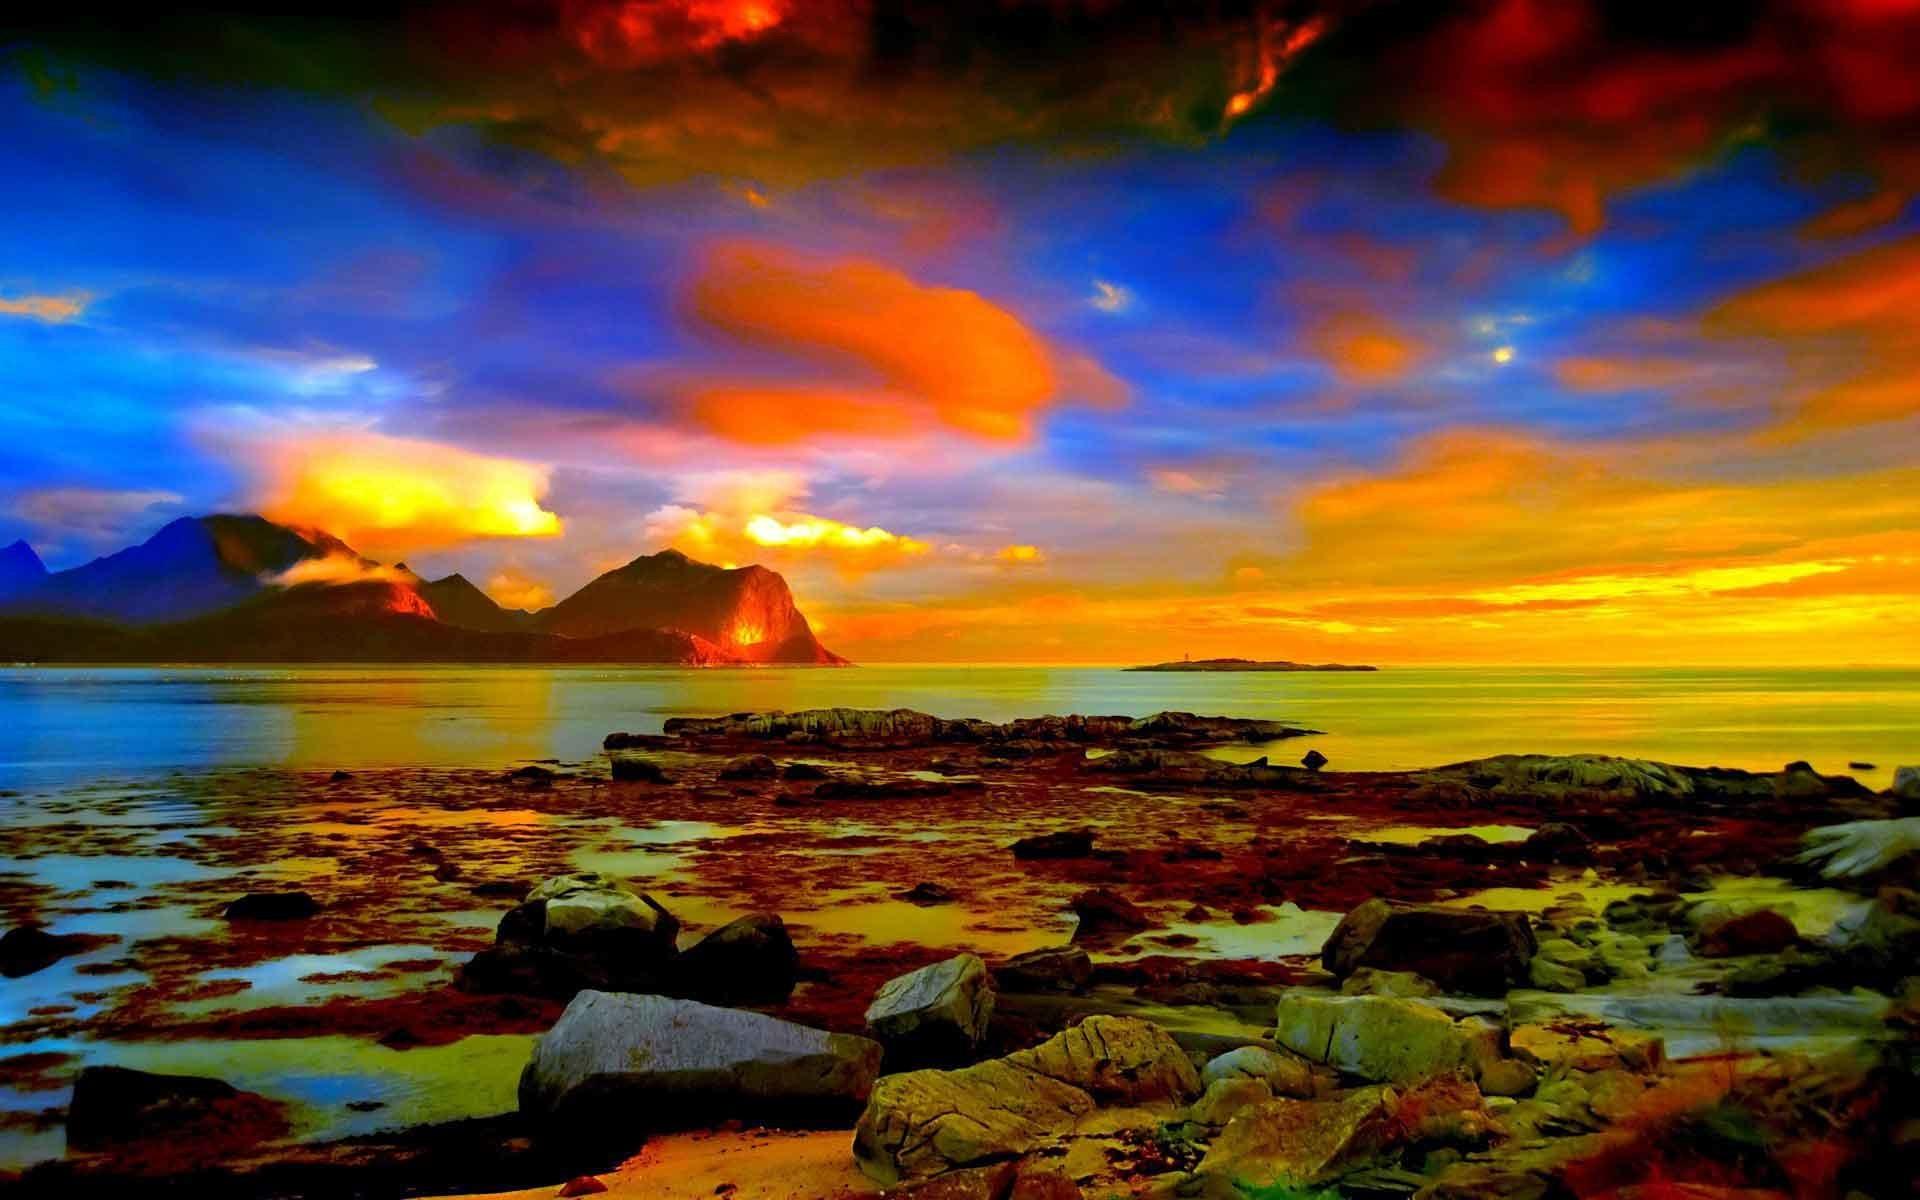 Sunrise Sunset Rocks Landscapes Horizon Beach Clouds Nice Nature Wallpaper  For Desktop